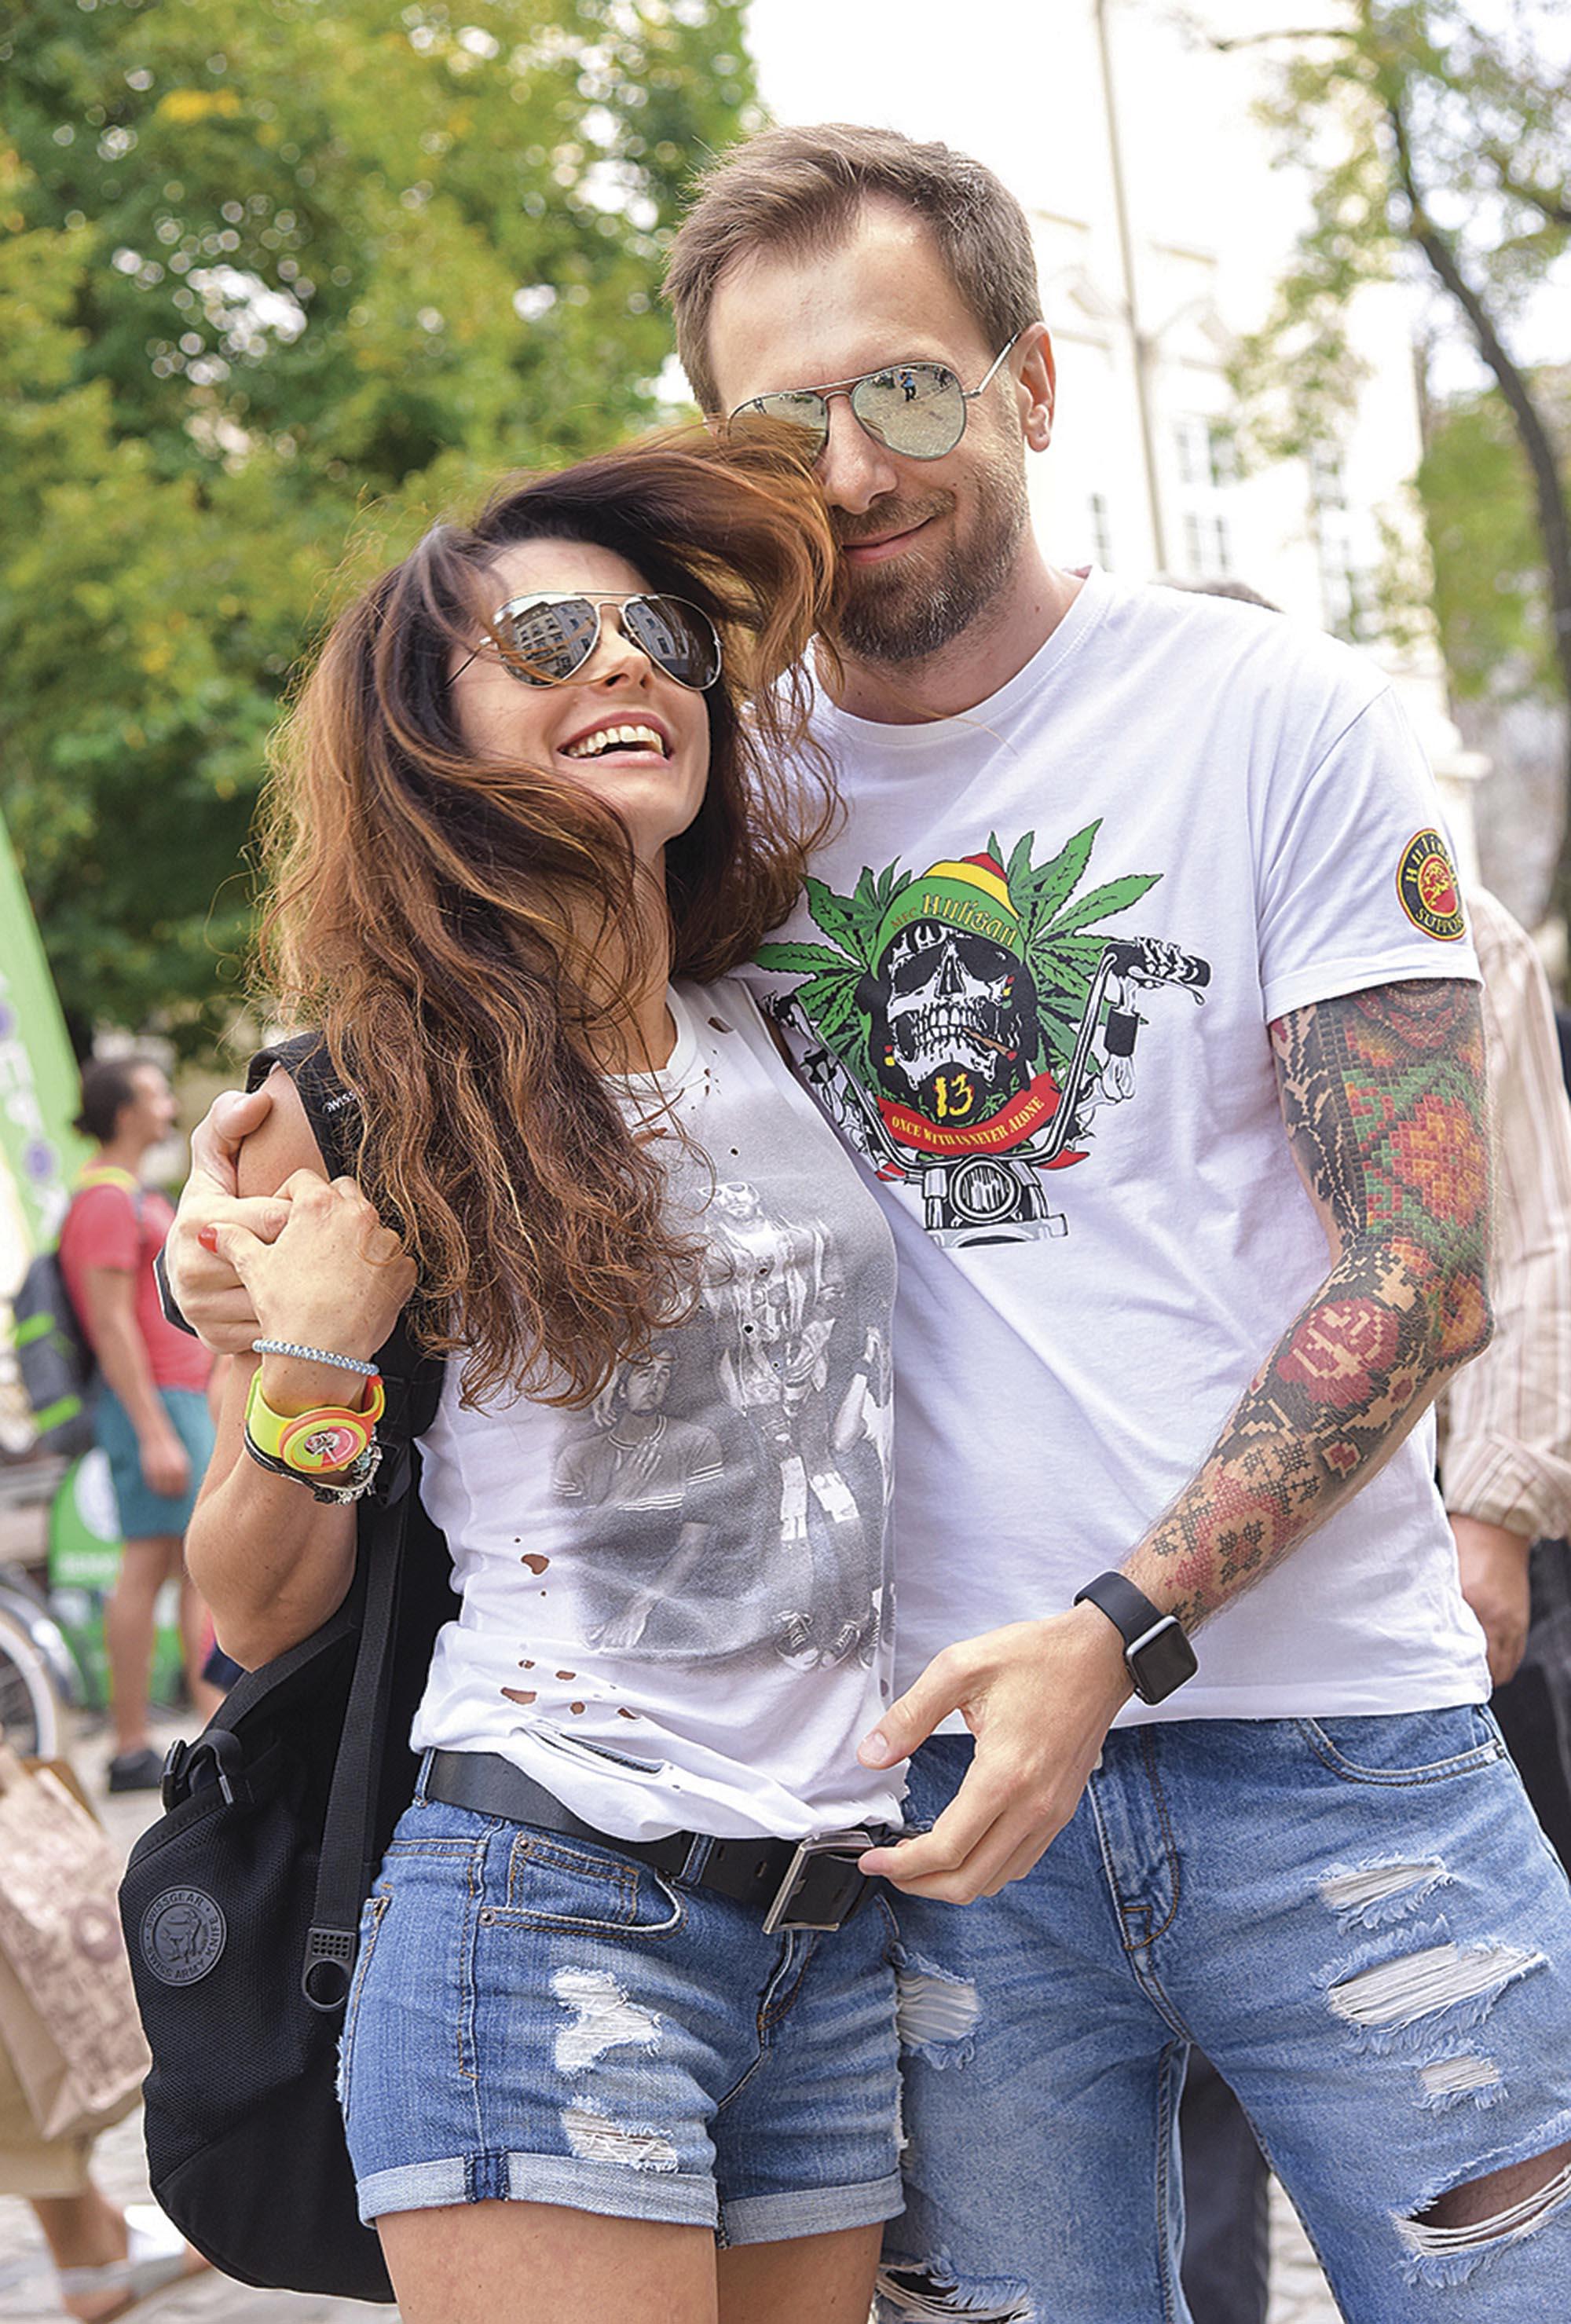 !!! festiwal-partnerstwa-2017-09-10_8870_HBR_LUFA-132 Fullsize